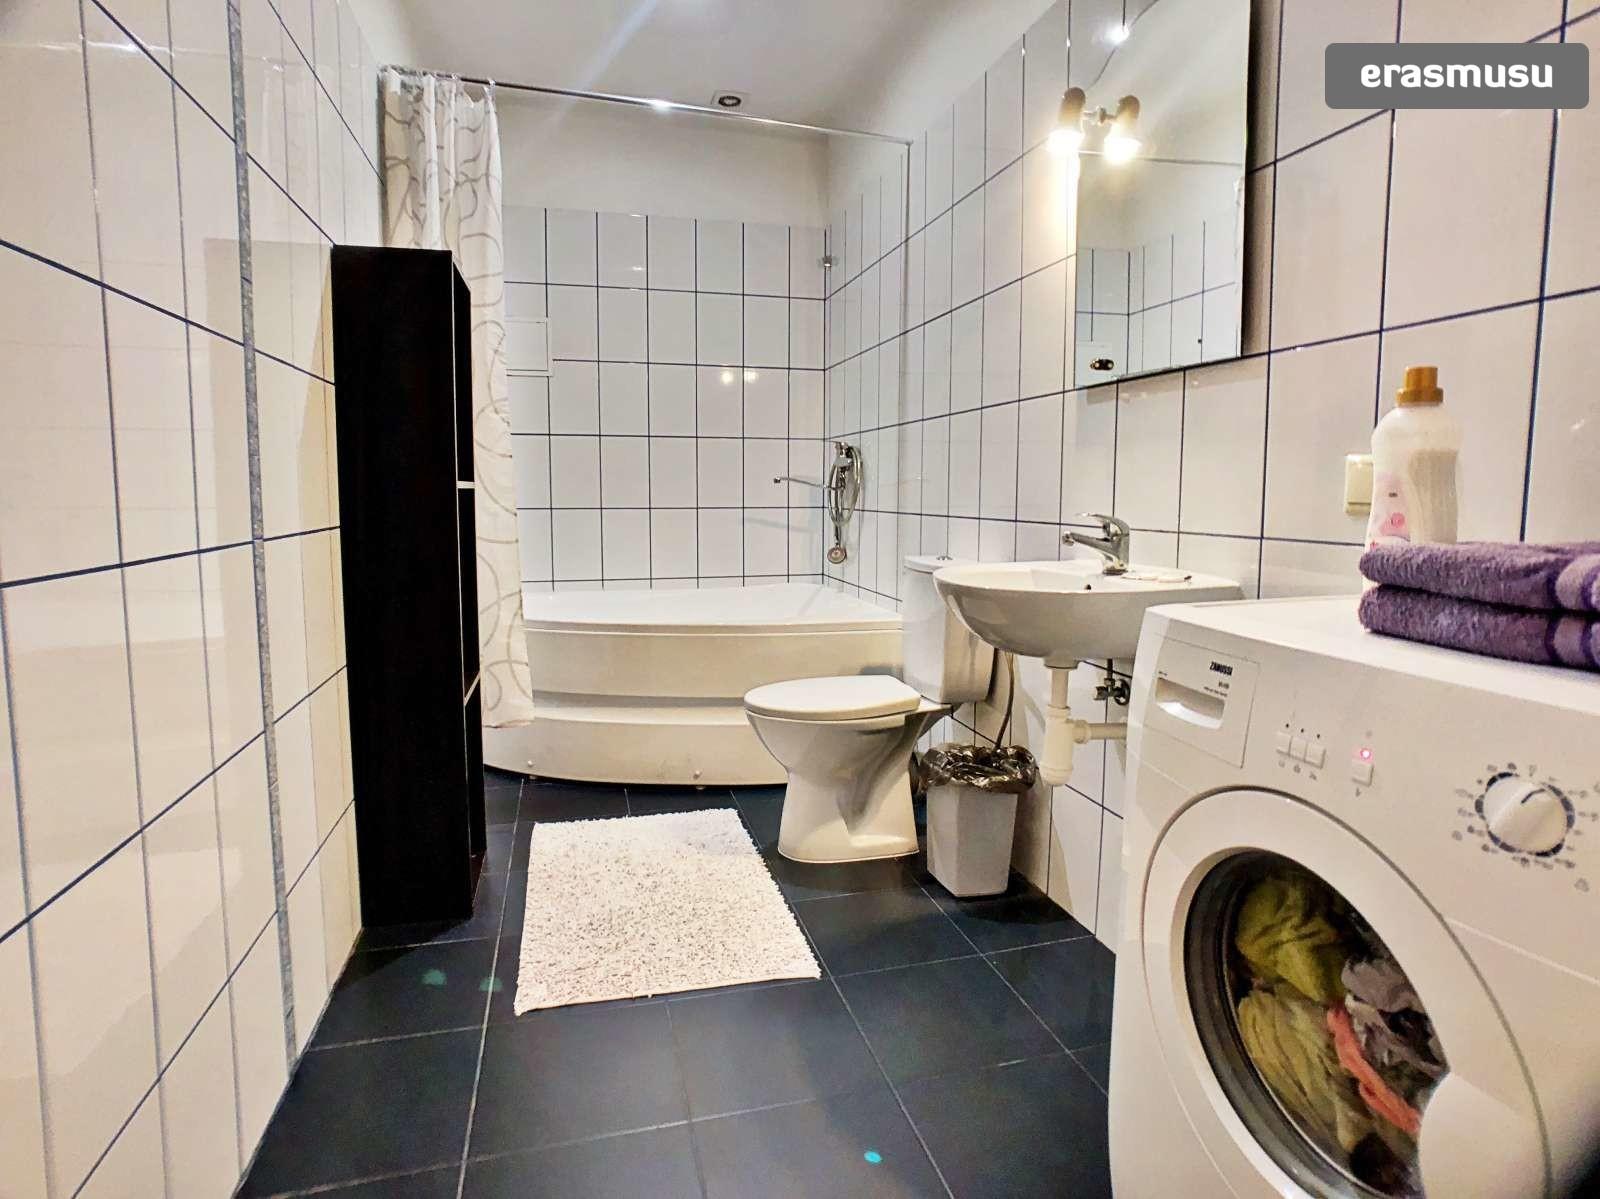 bright-1-bedroom-apartment-rent-maskavas-forstate-d40047405ff475